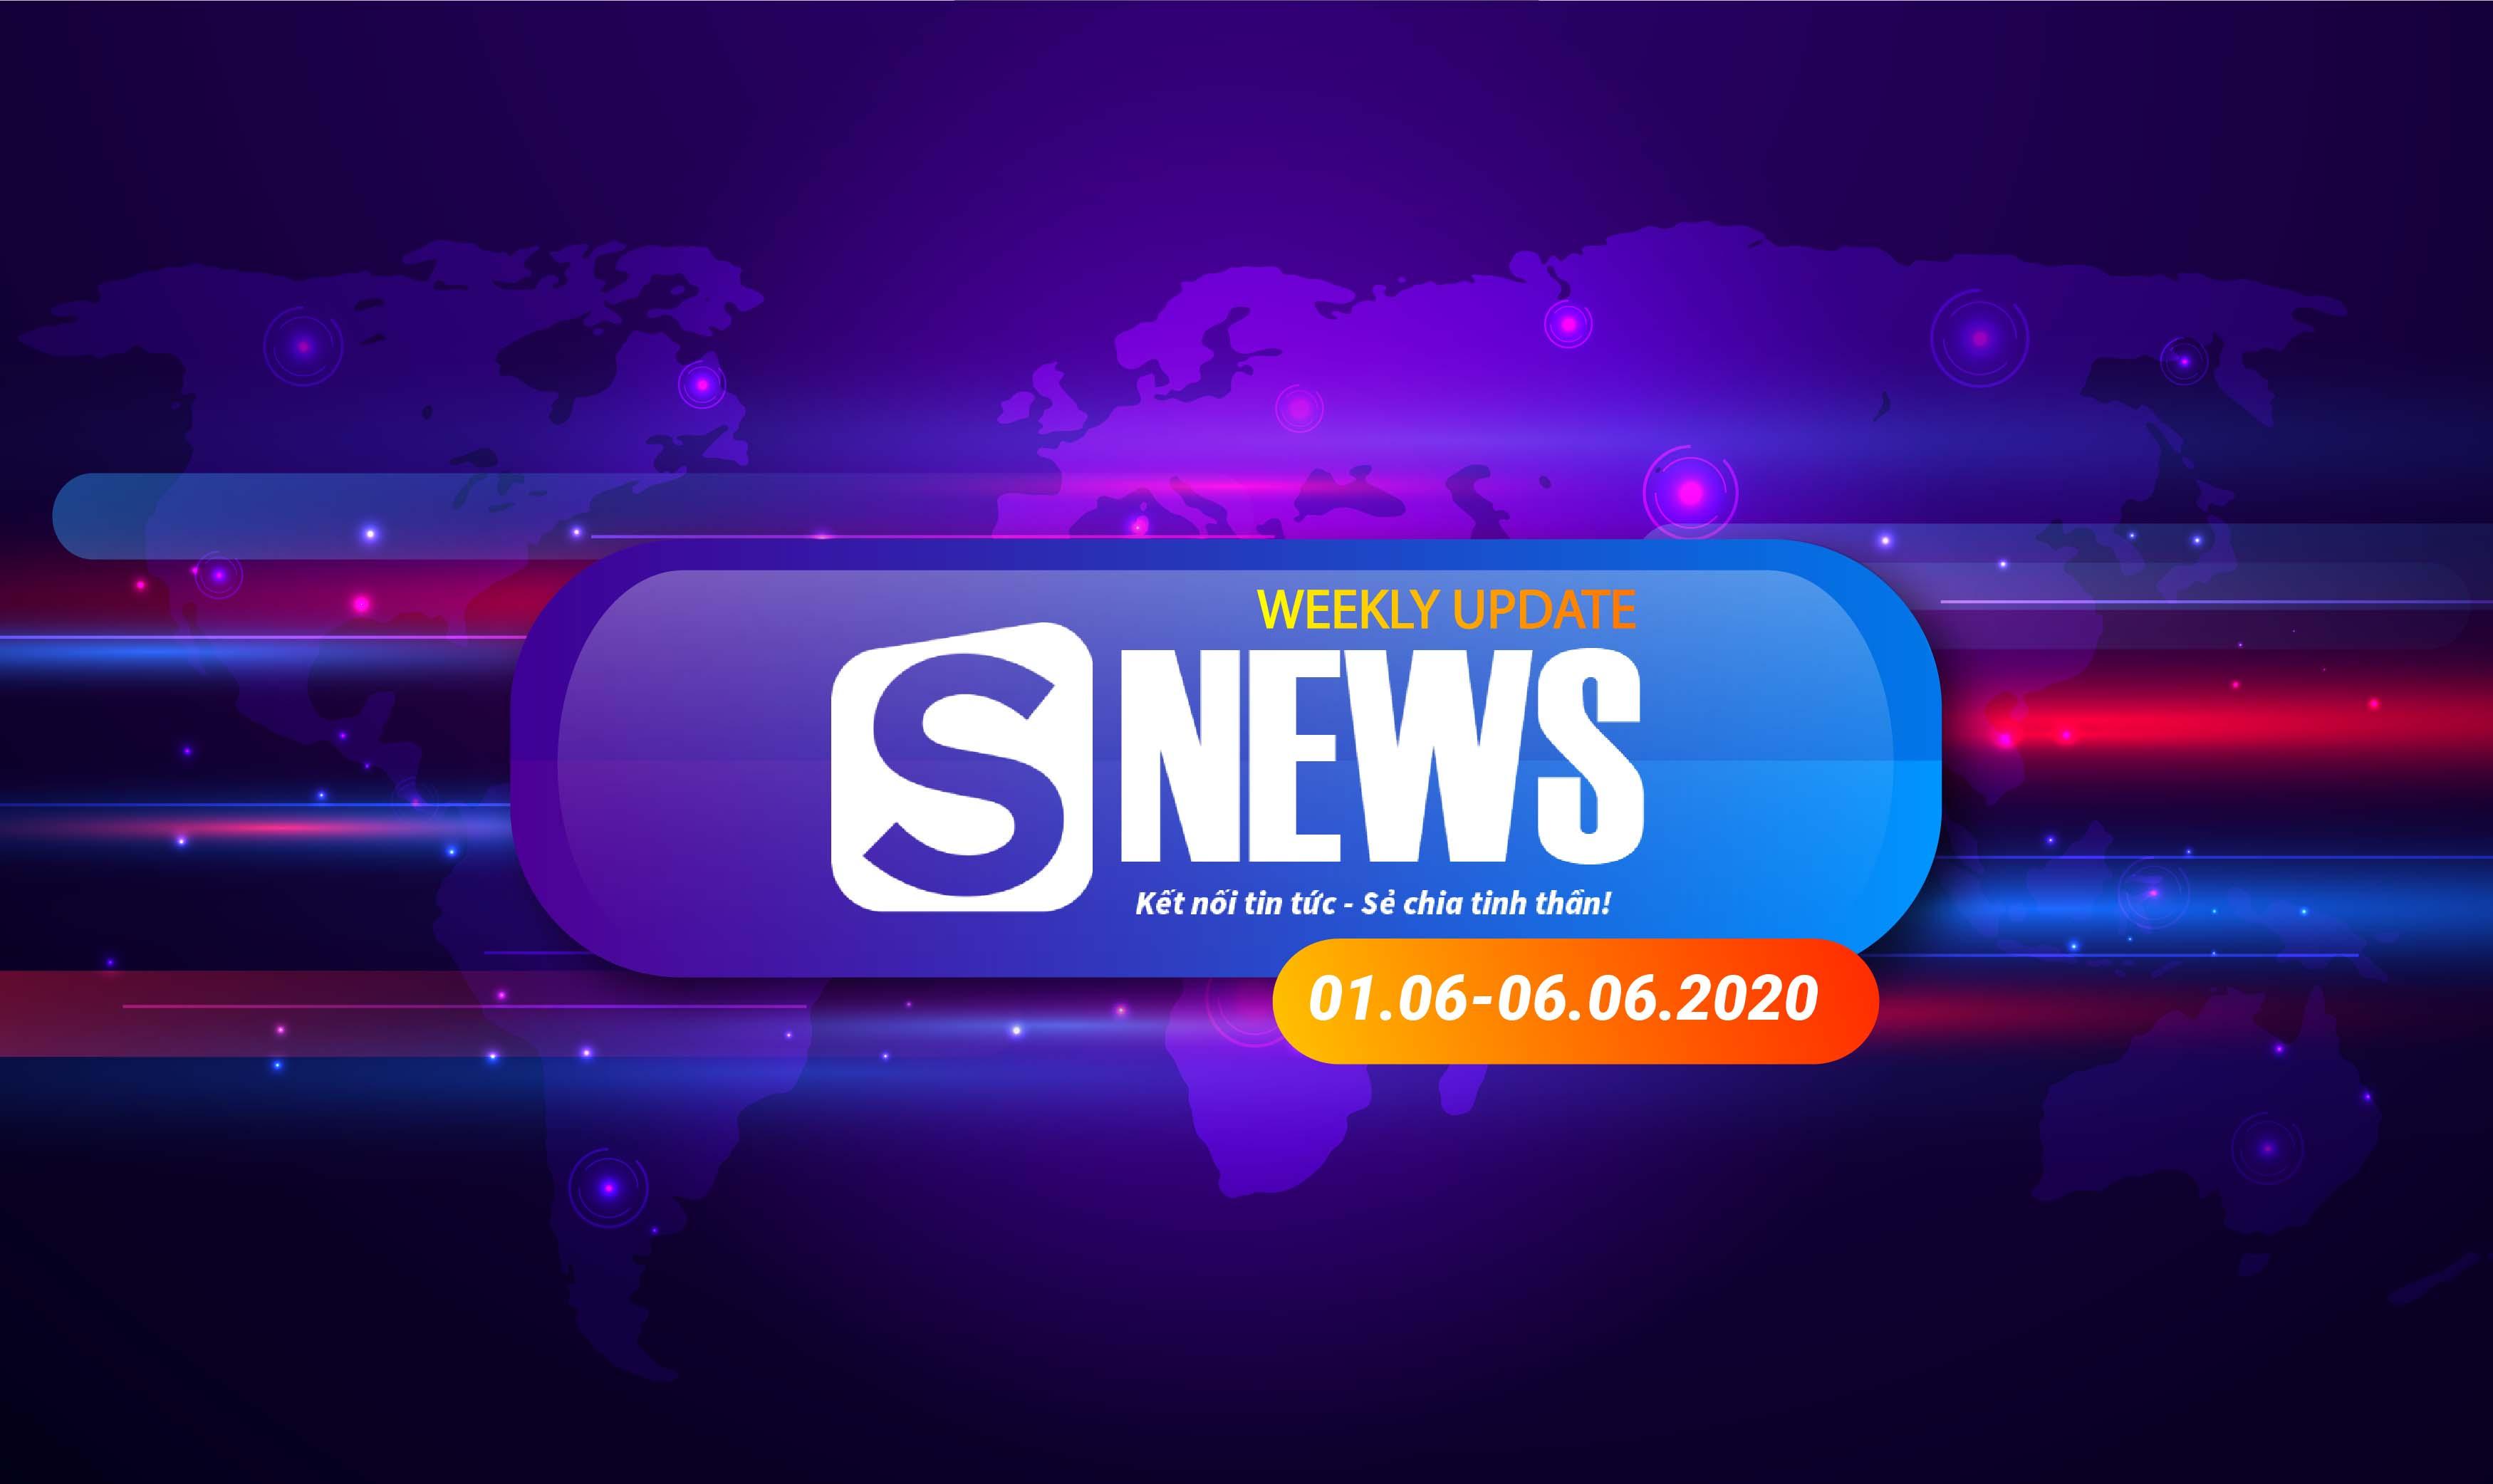 Tổng hợp tin tức Sapo tuần qua (01.06 - 06.06.2020)